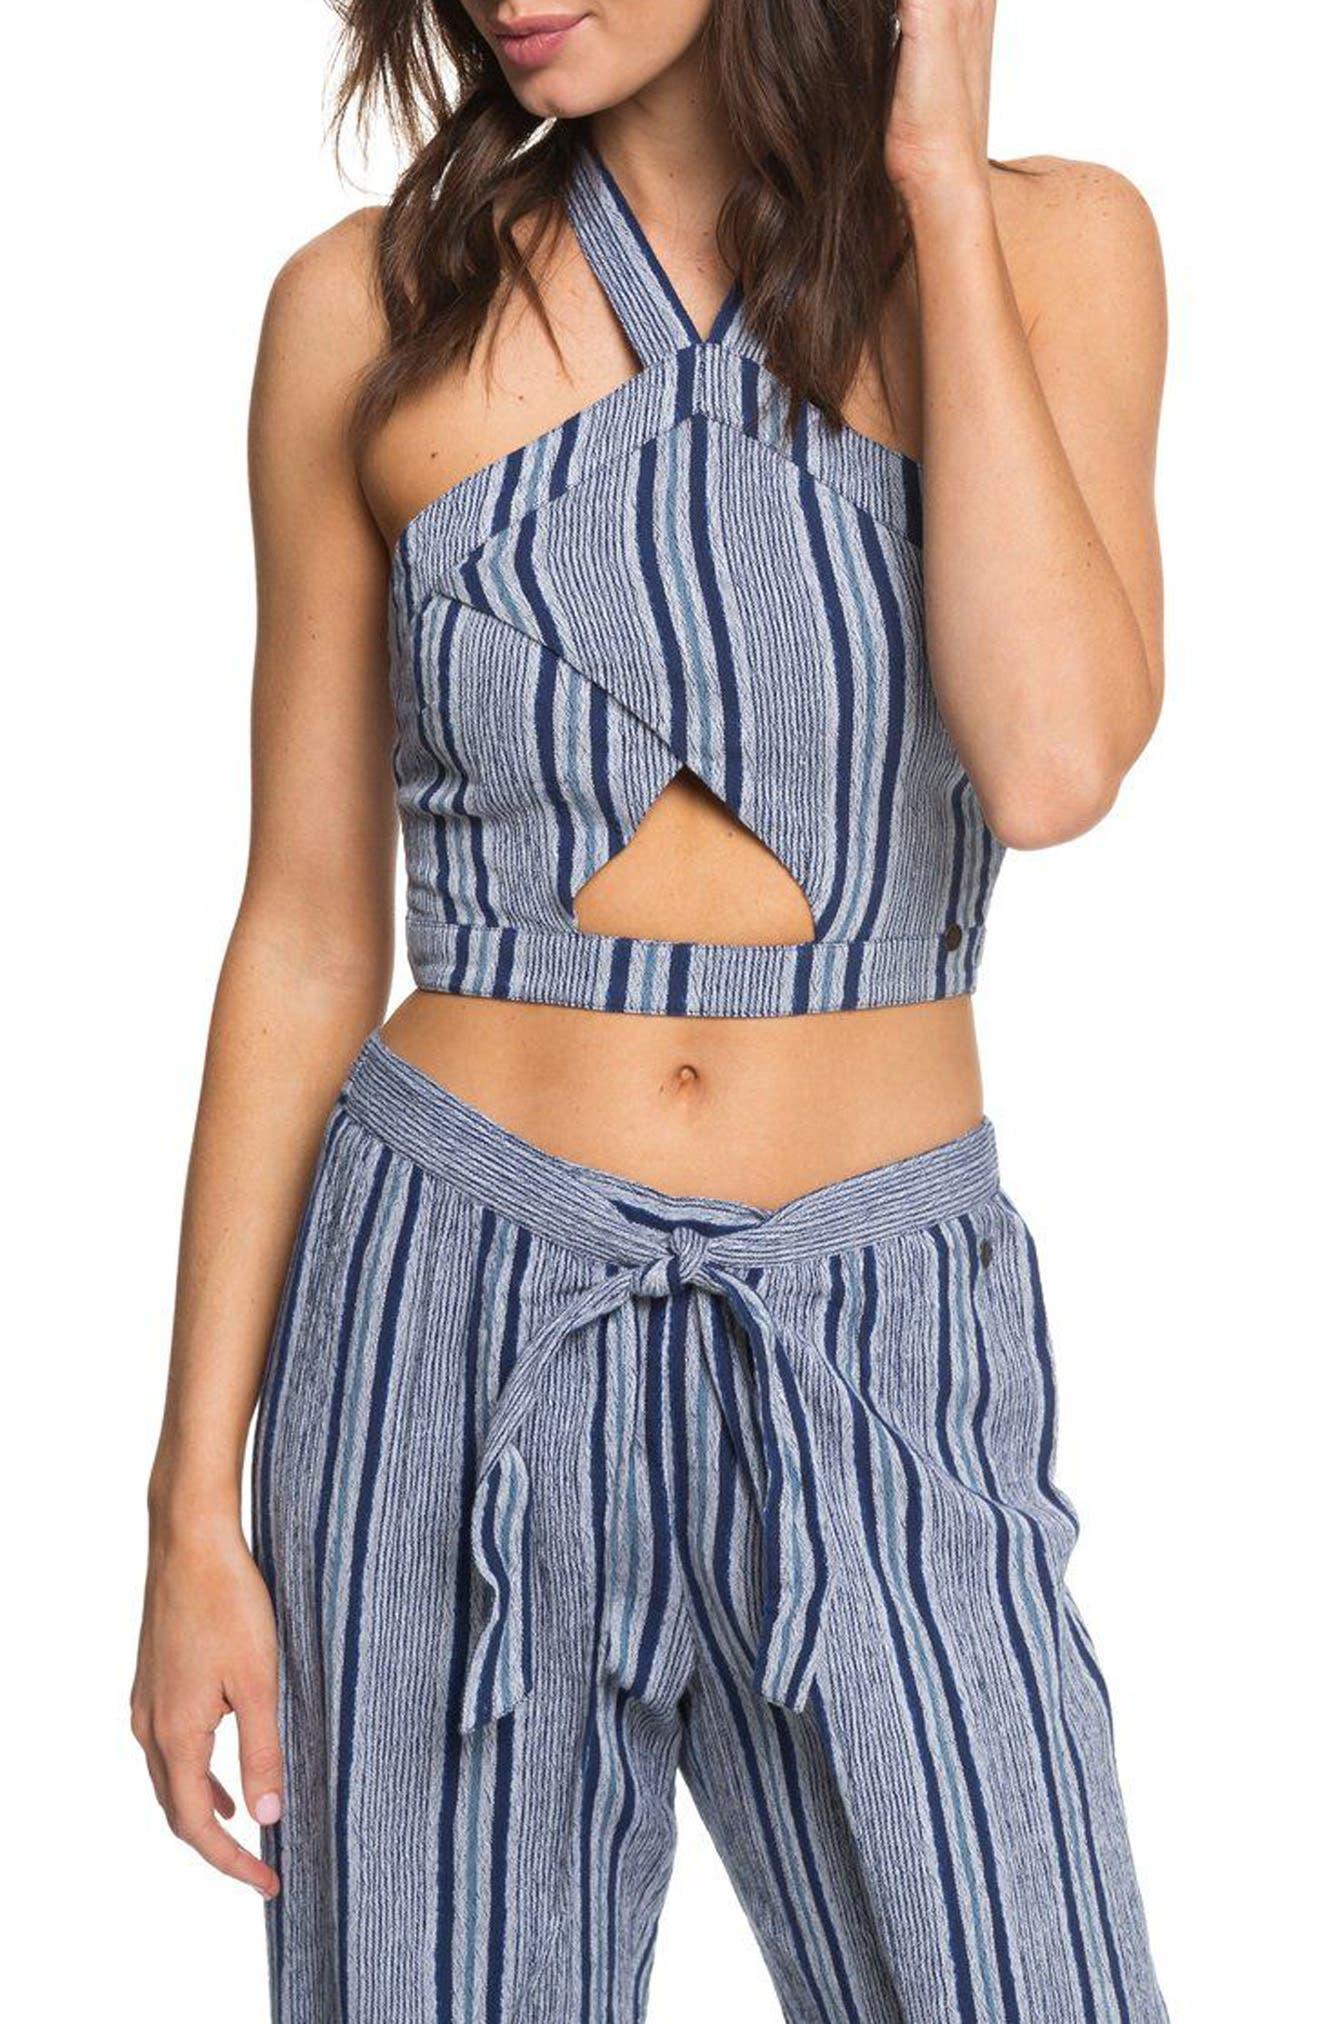 Jessa Cutout Halter Crop Top,                             Main thumbnail 1, color,                             Deep Cobalt Cherokee Stripe